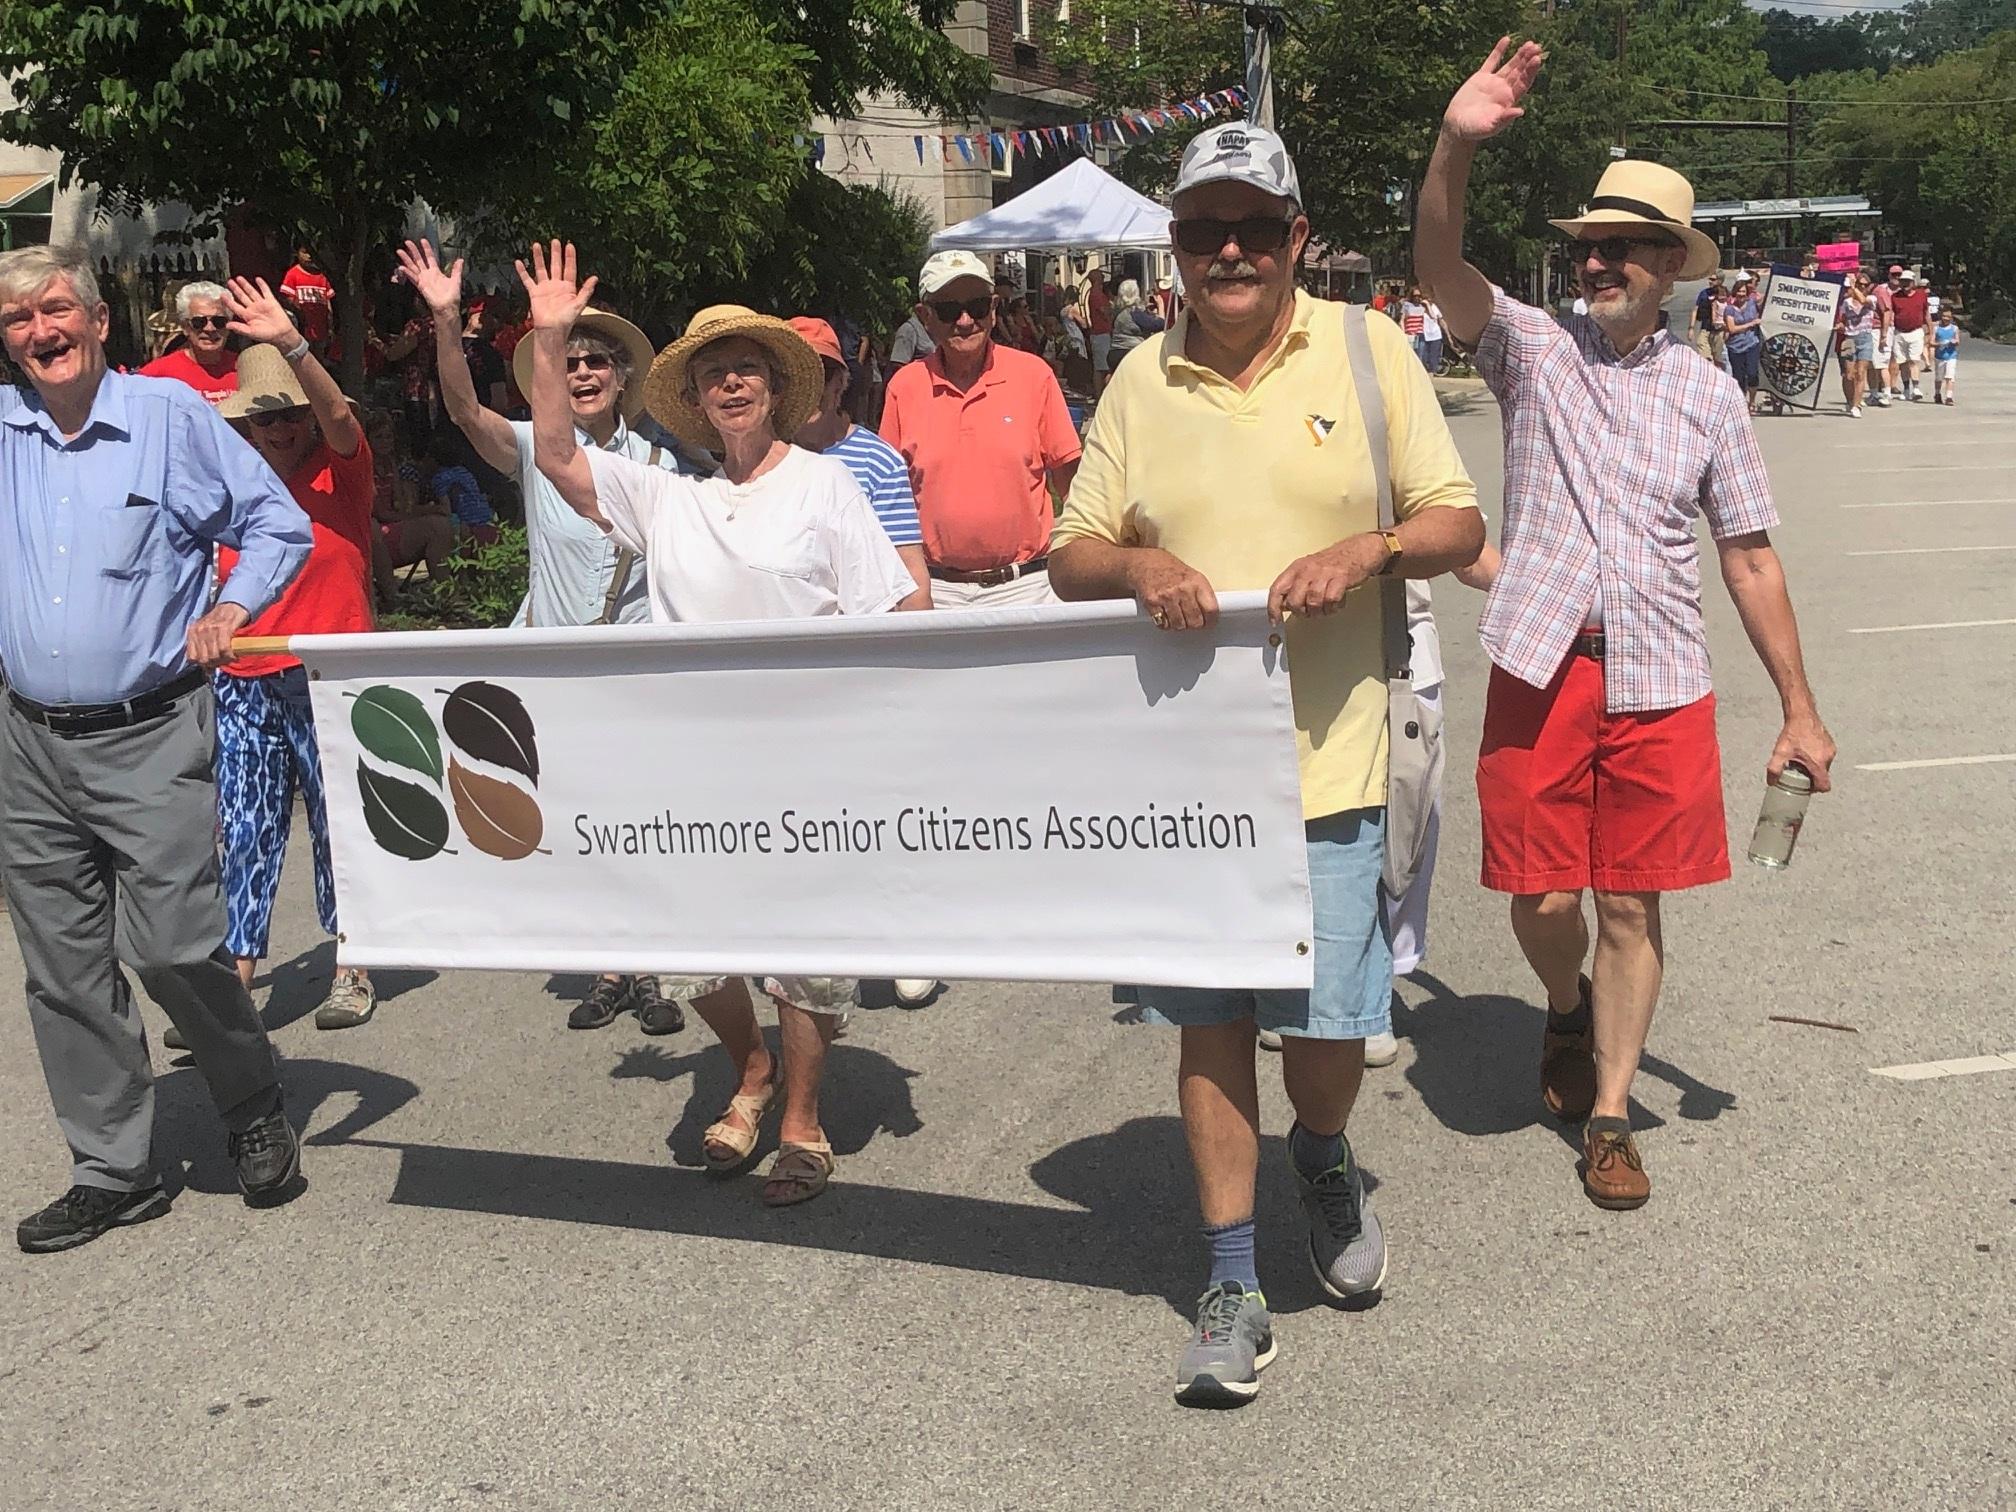 Members of the Swarthmore Senior Citizens Association